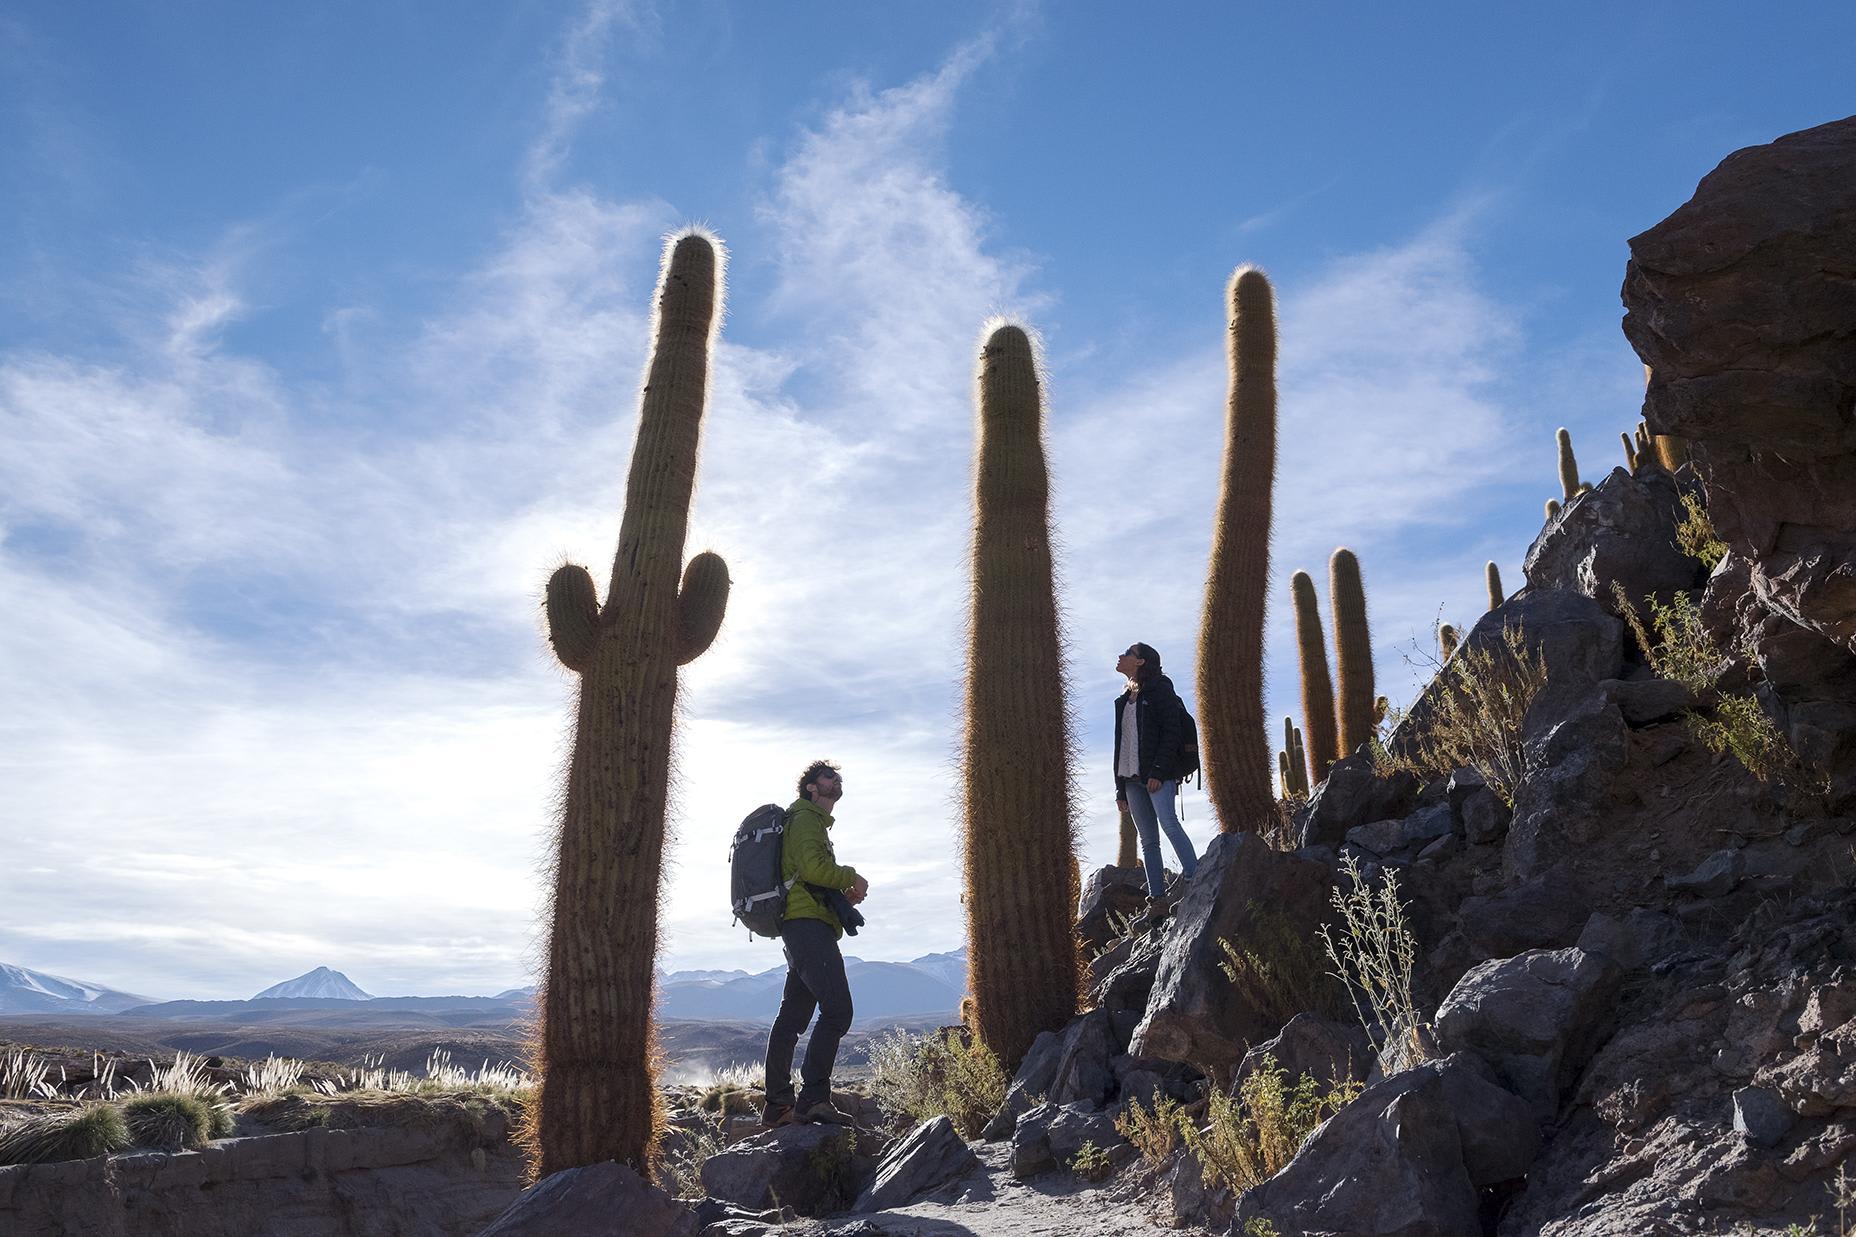 Tierra Atacama's 6-Day All Inclusive Program Day Four - Guatin-Gatchi Valley Hike.